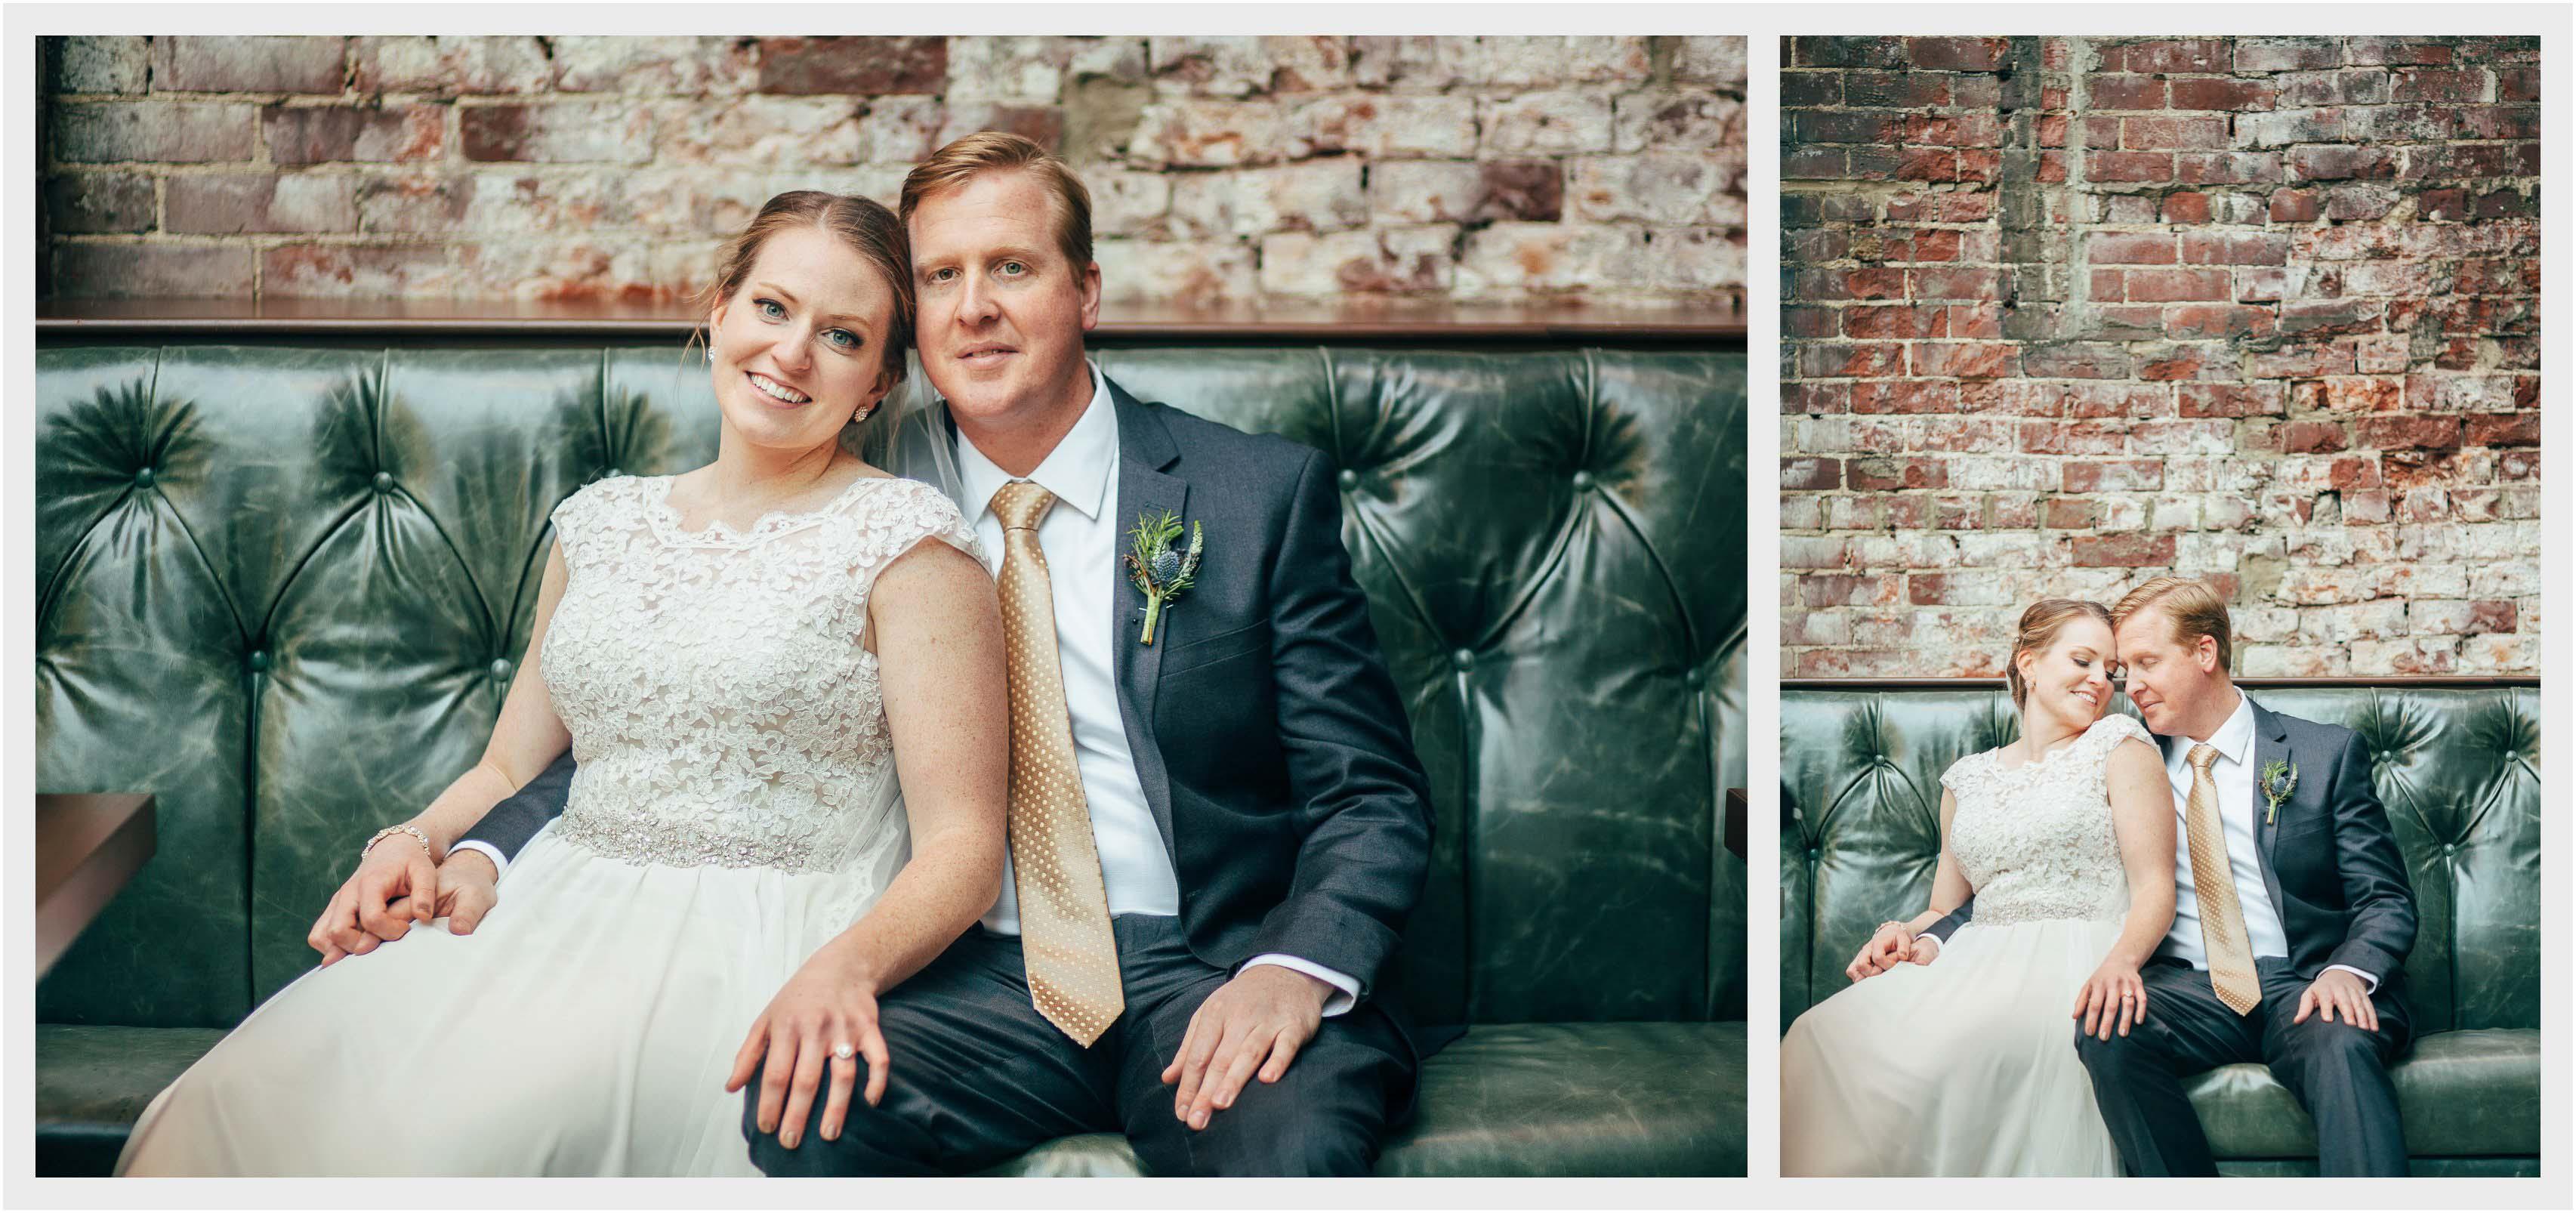 Rhinegeist wedding photos 17